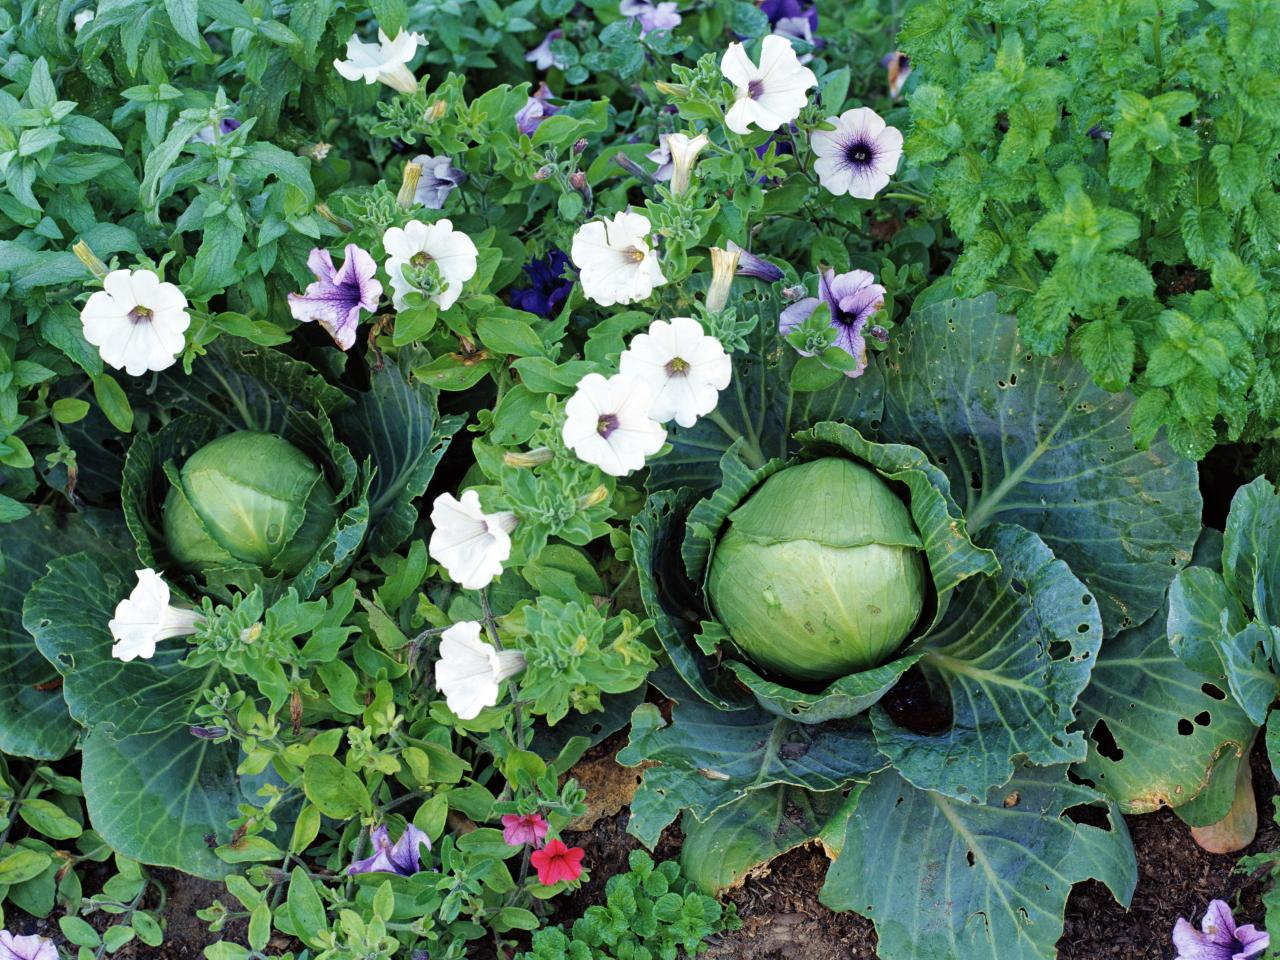 vegetable garden plants photo - 2